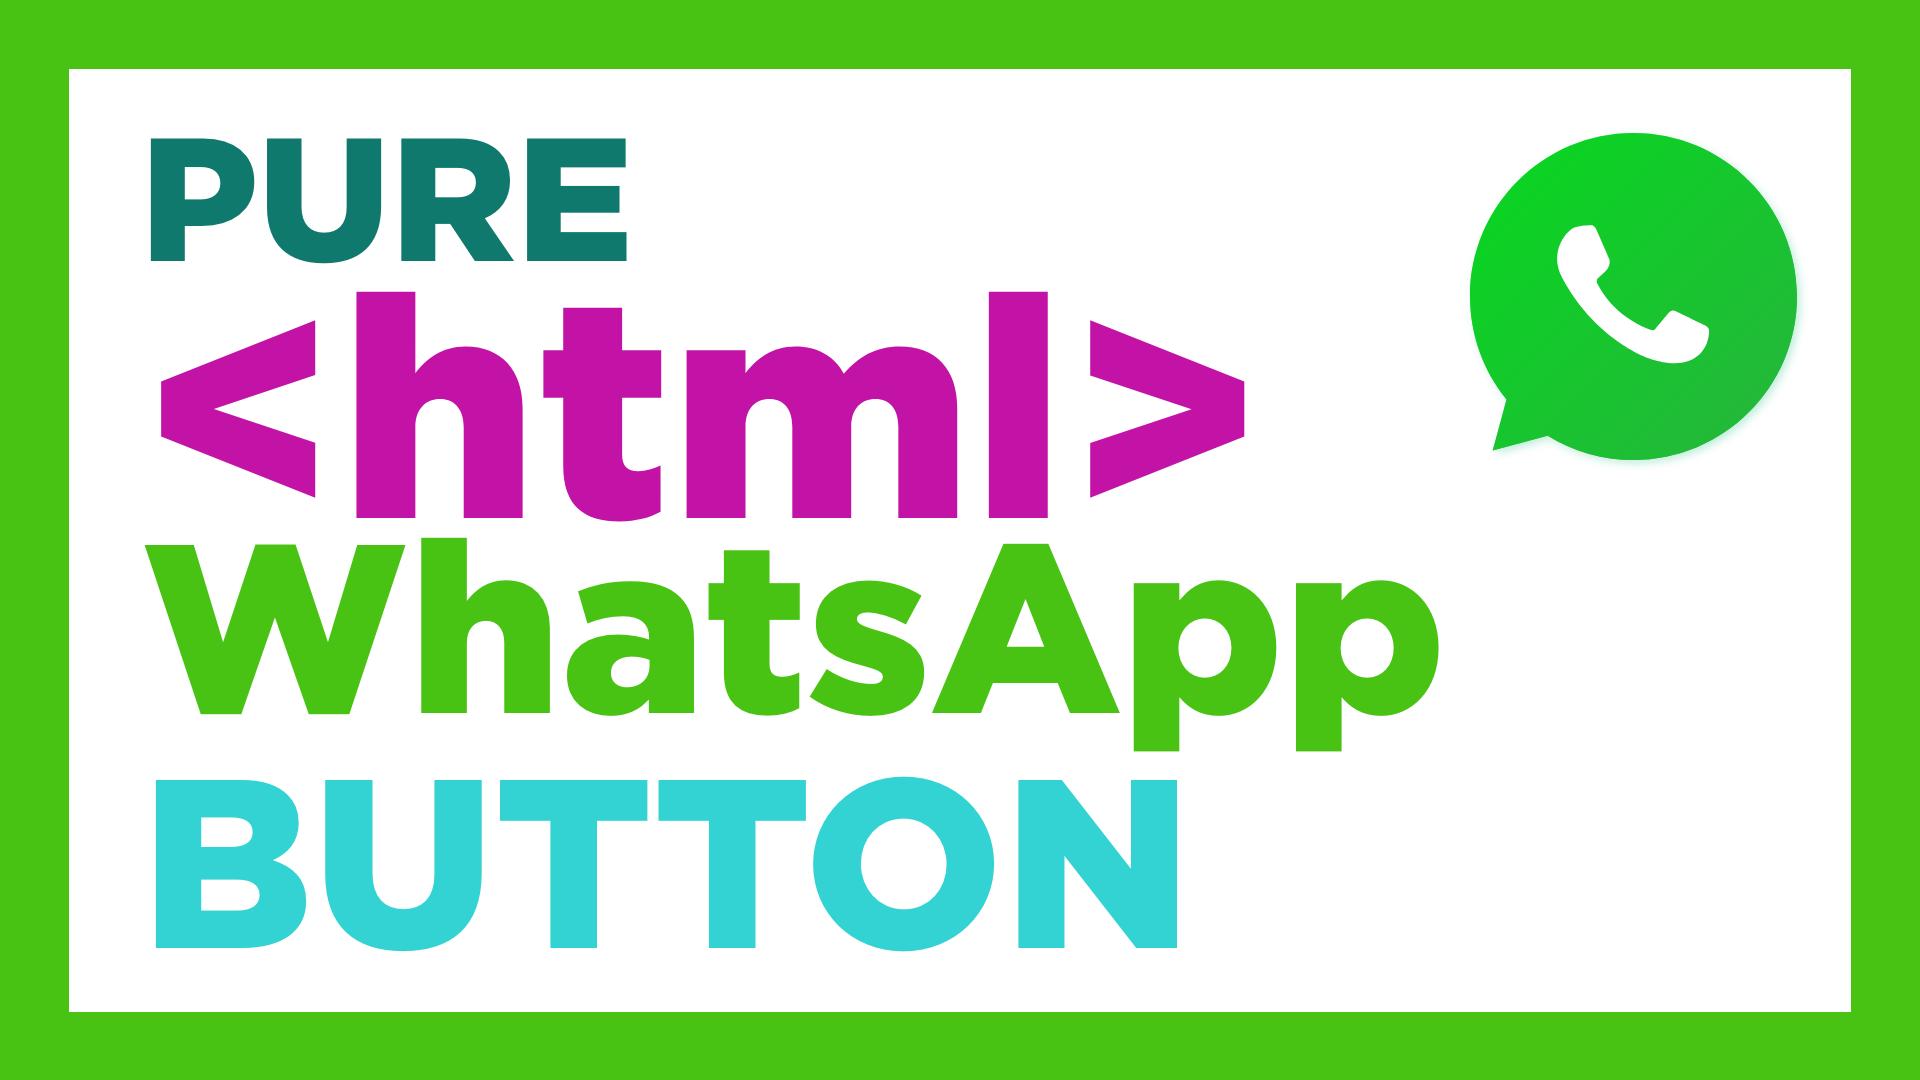 whatsapp link html